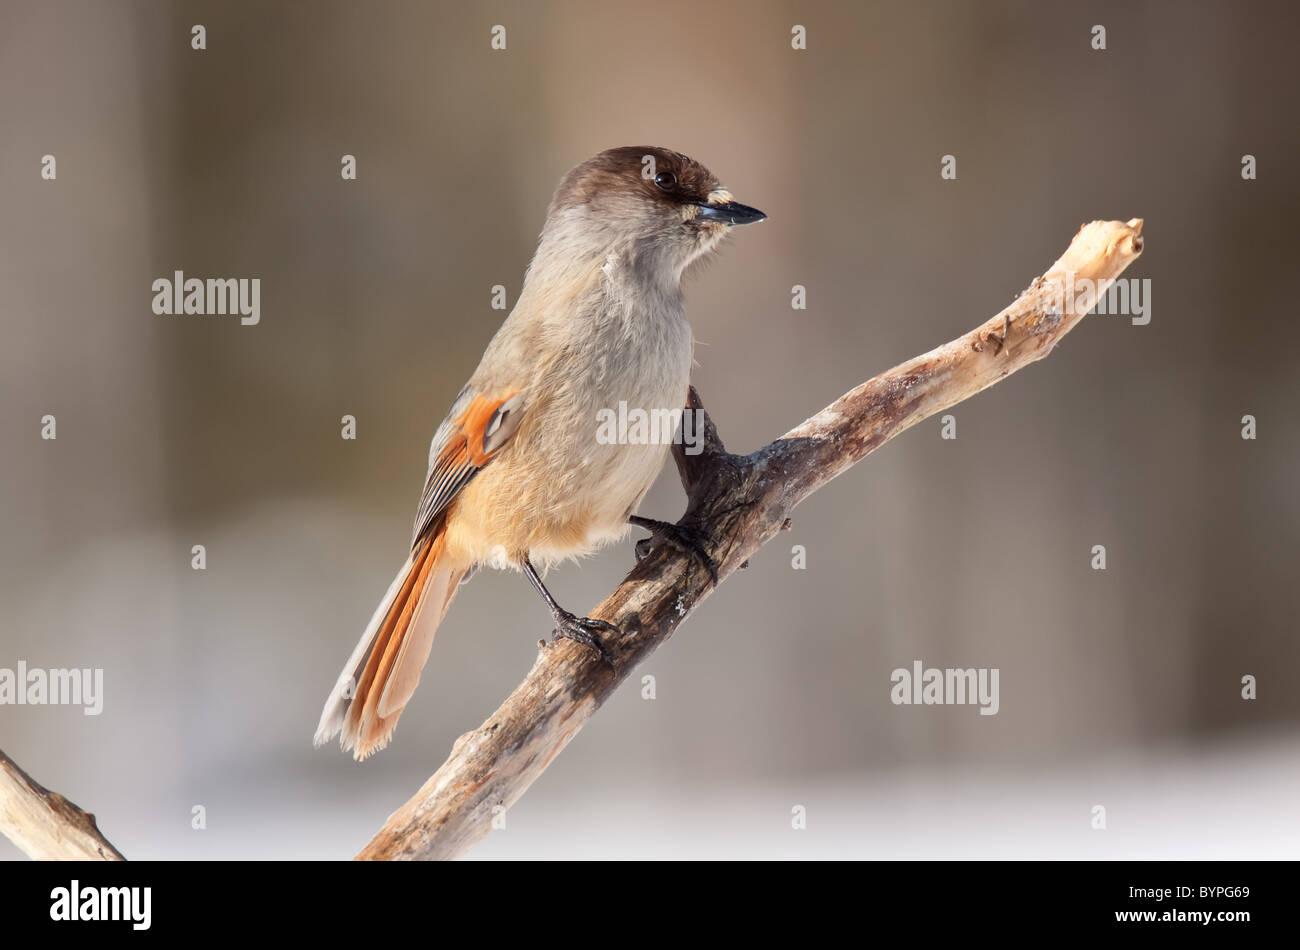 Siberian jay [Perisoreus infaustus] Unglückshäher Hamra Nationalpark, Sweden - Stock Image